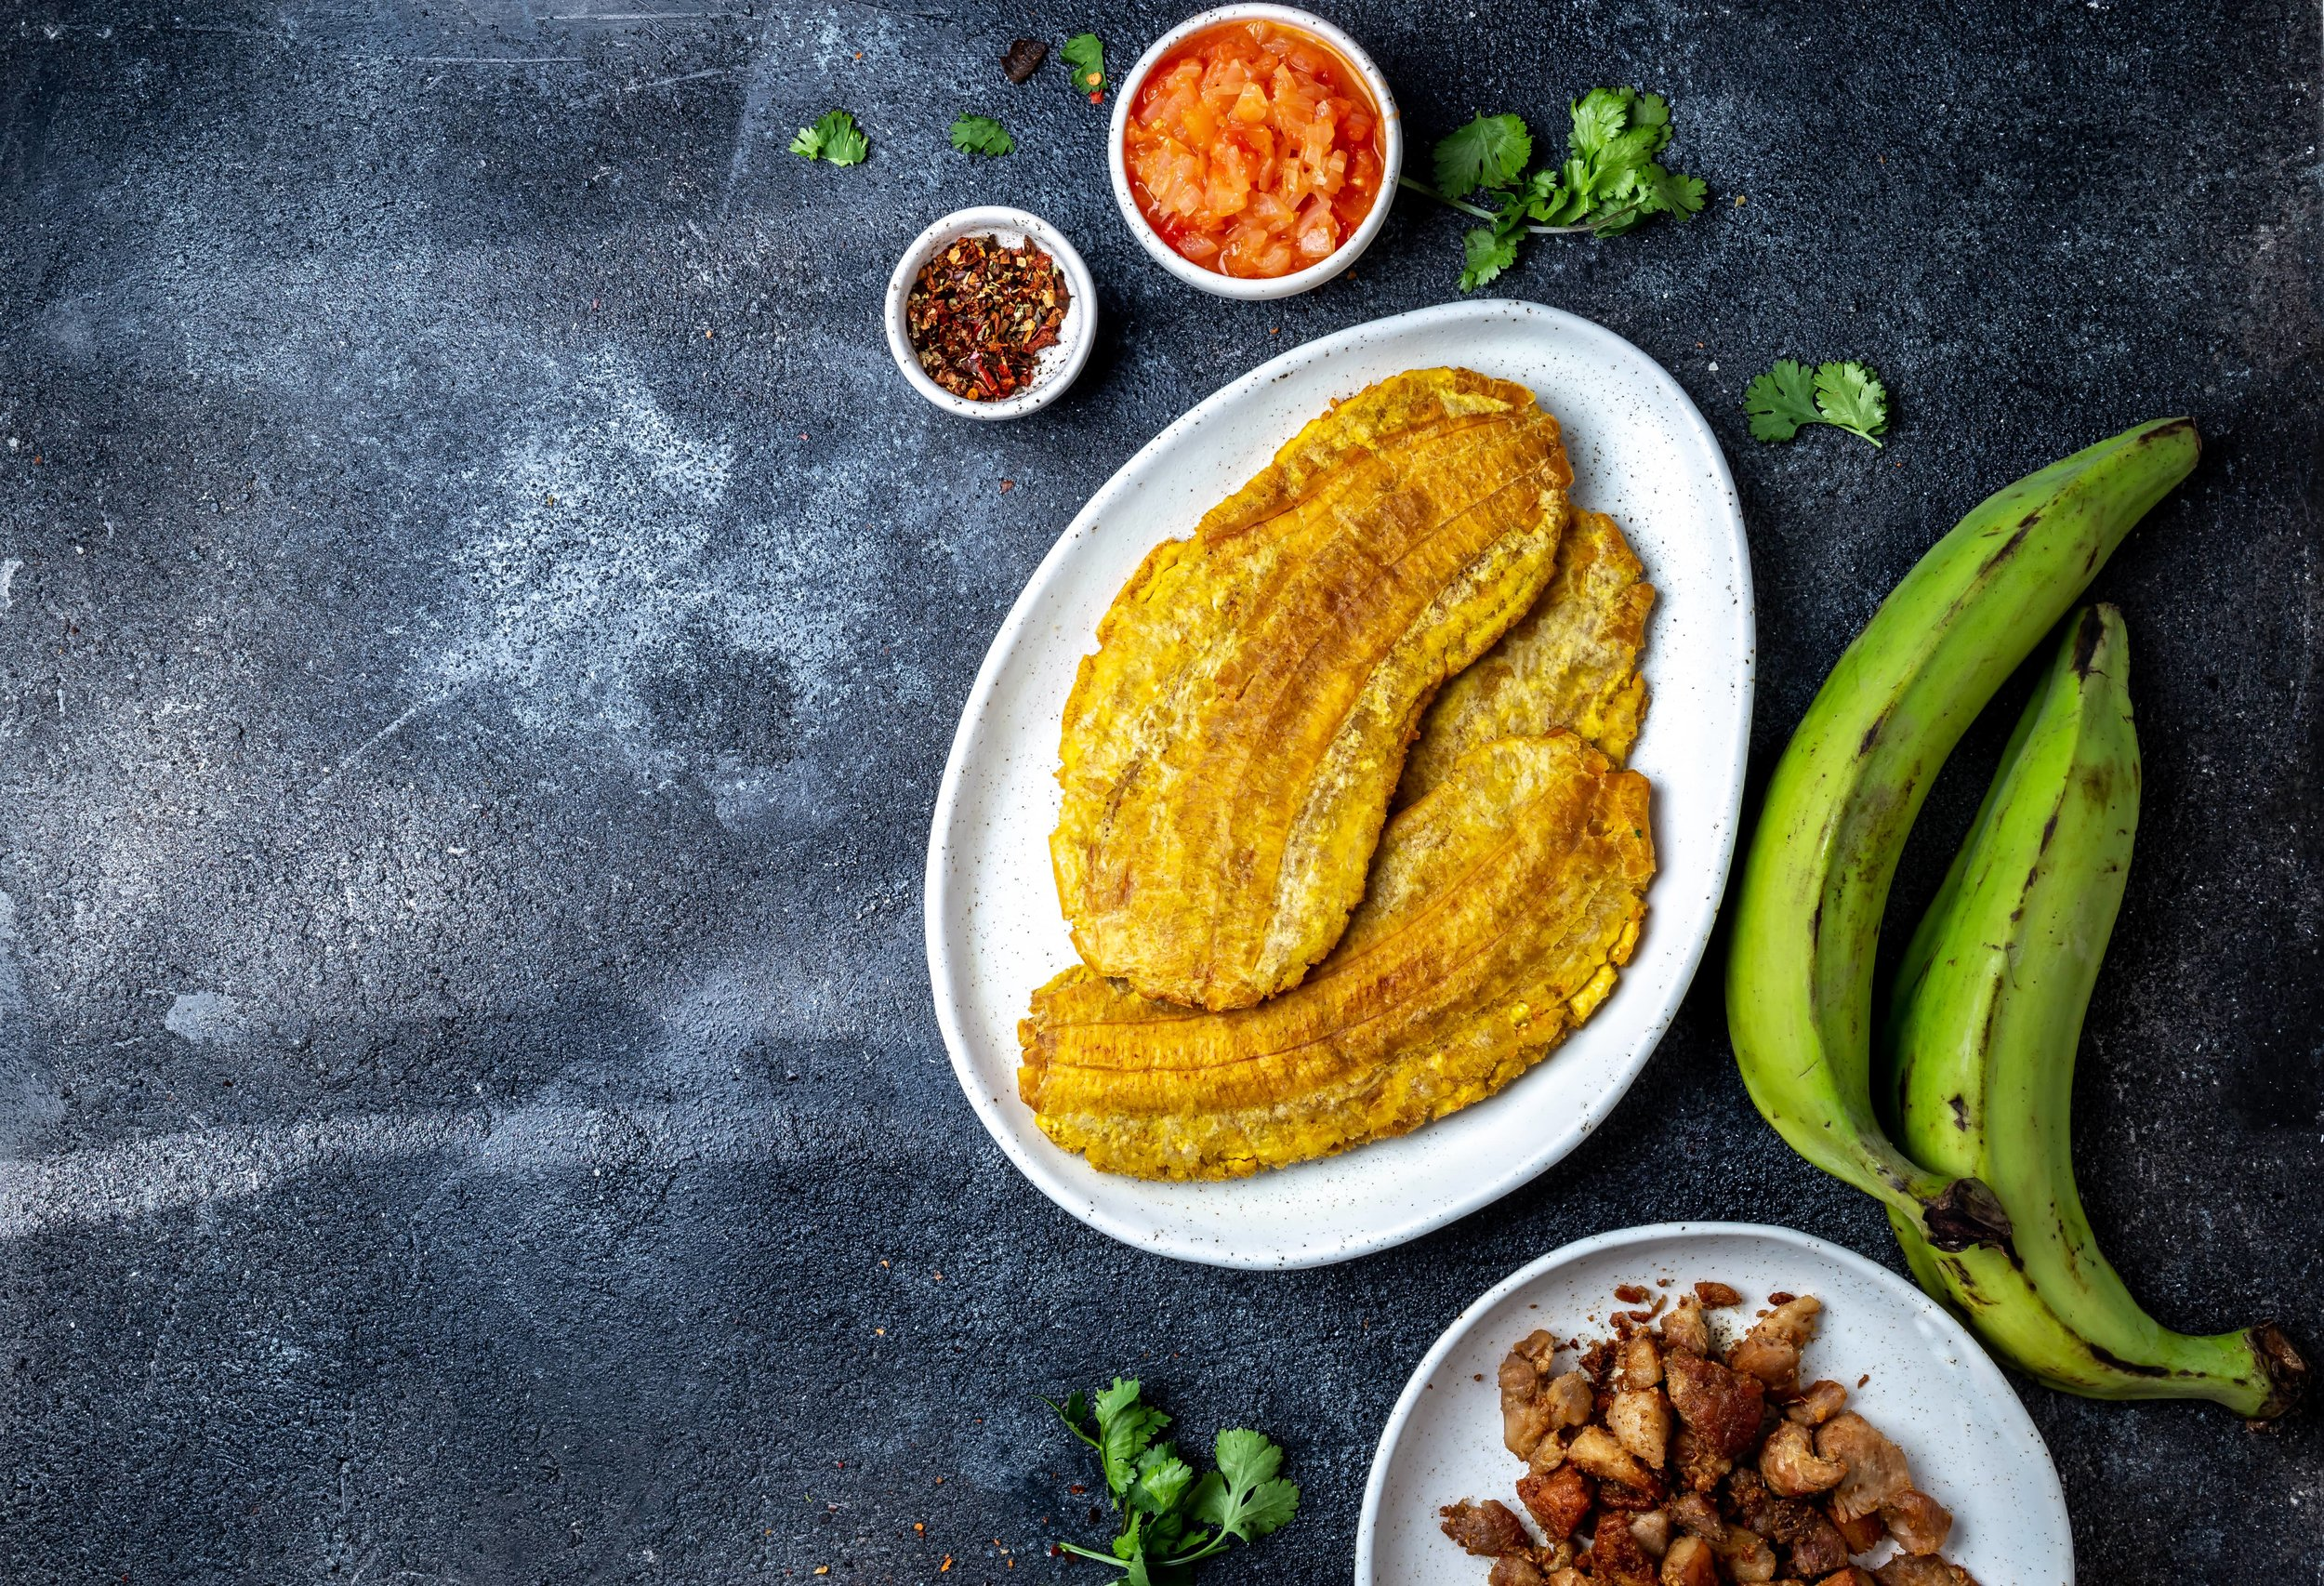 food background - plantains.jpg